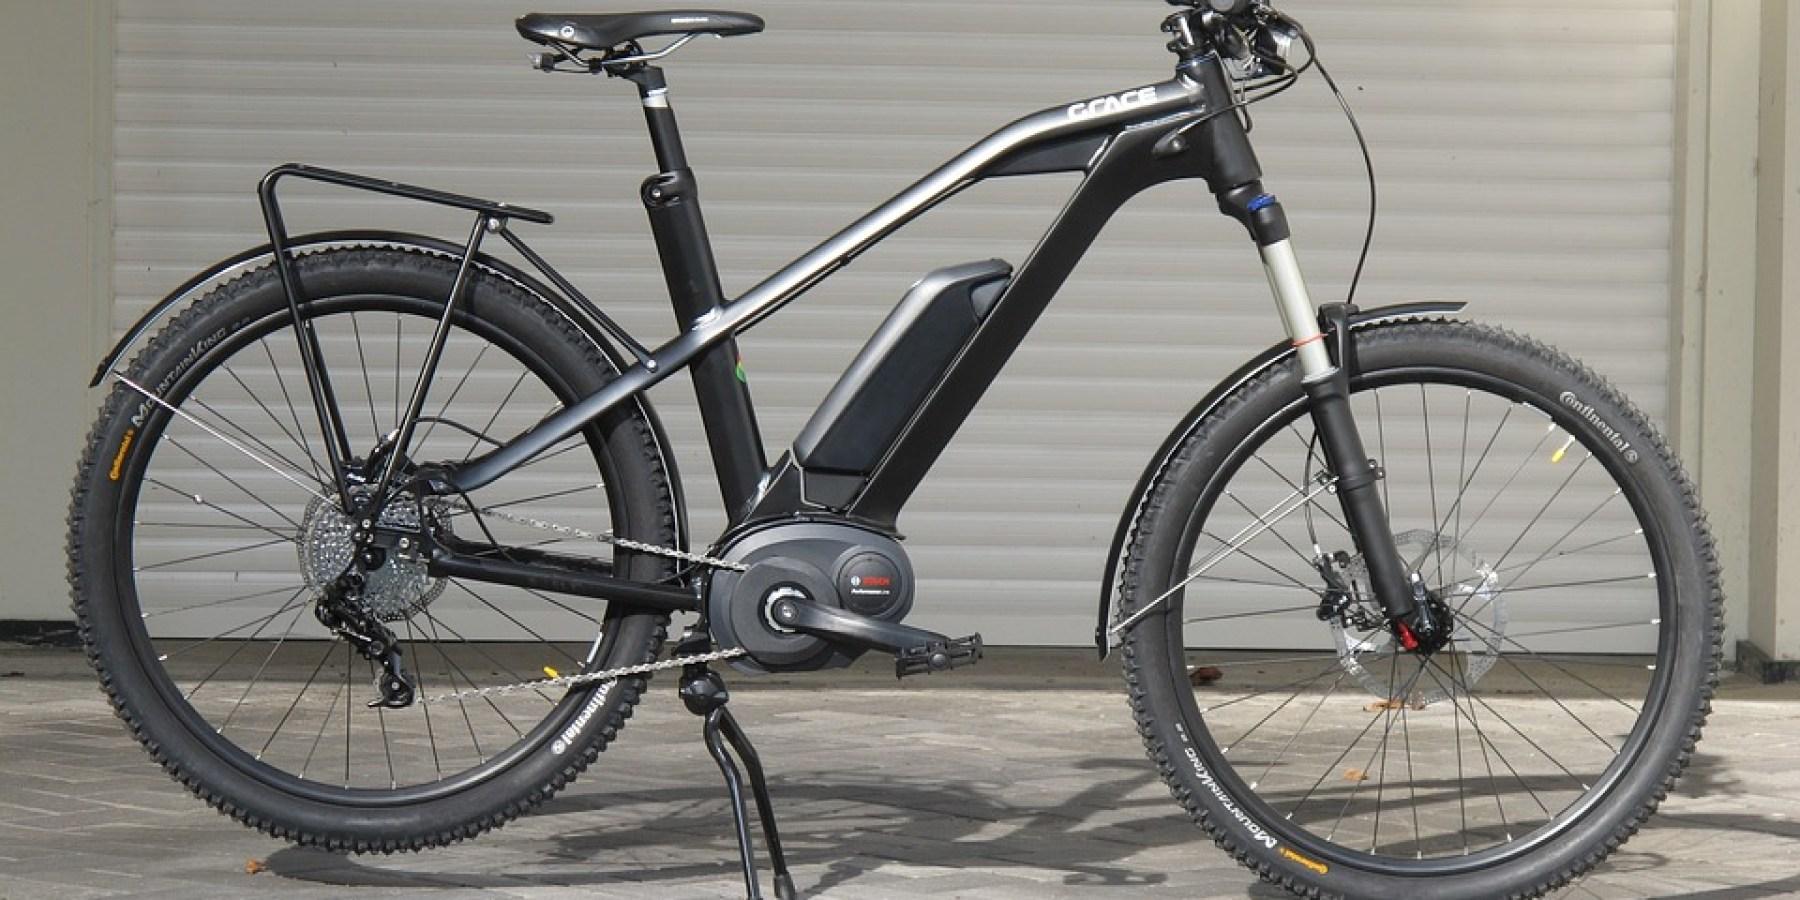 Dieb entwendet E-Bike